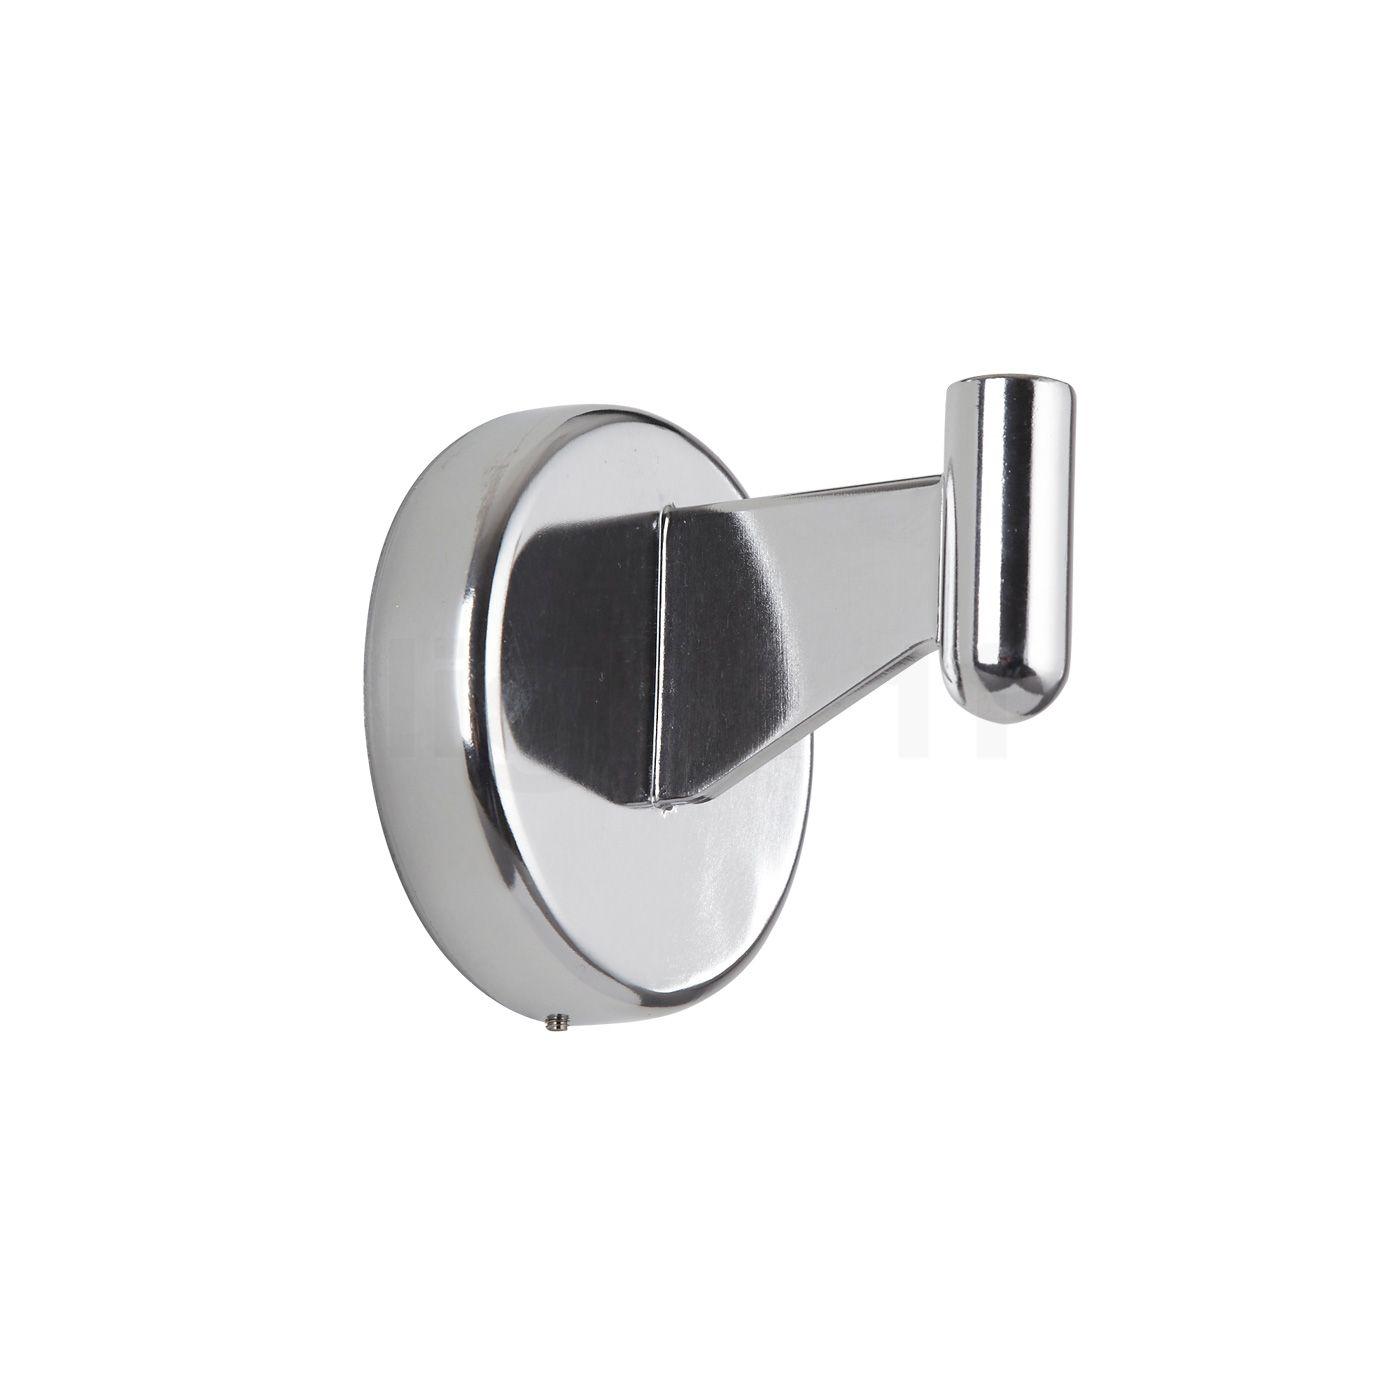 Artemide Spare part Tolomeo wall bracket buy at light11 eu. Artemide Lighting Spare Parts. Home Design Ideas